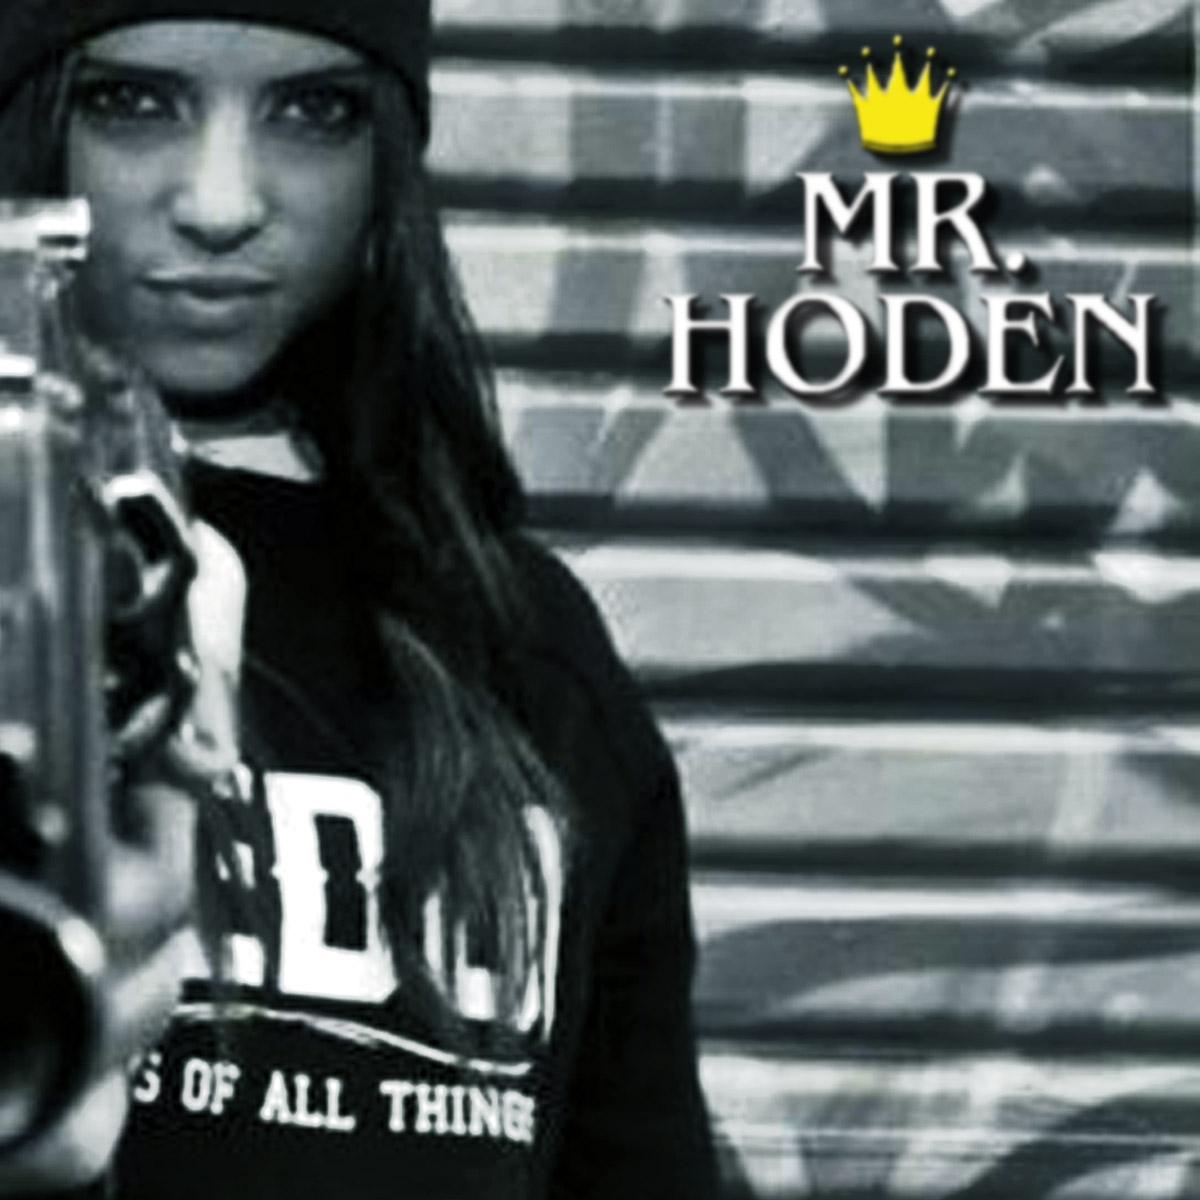 Upcoming: Mr. Hoden - EPIC UNDERGROUND RAP BEAT 2021 [FREE BEAT]